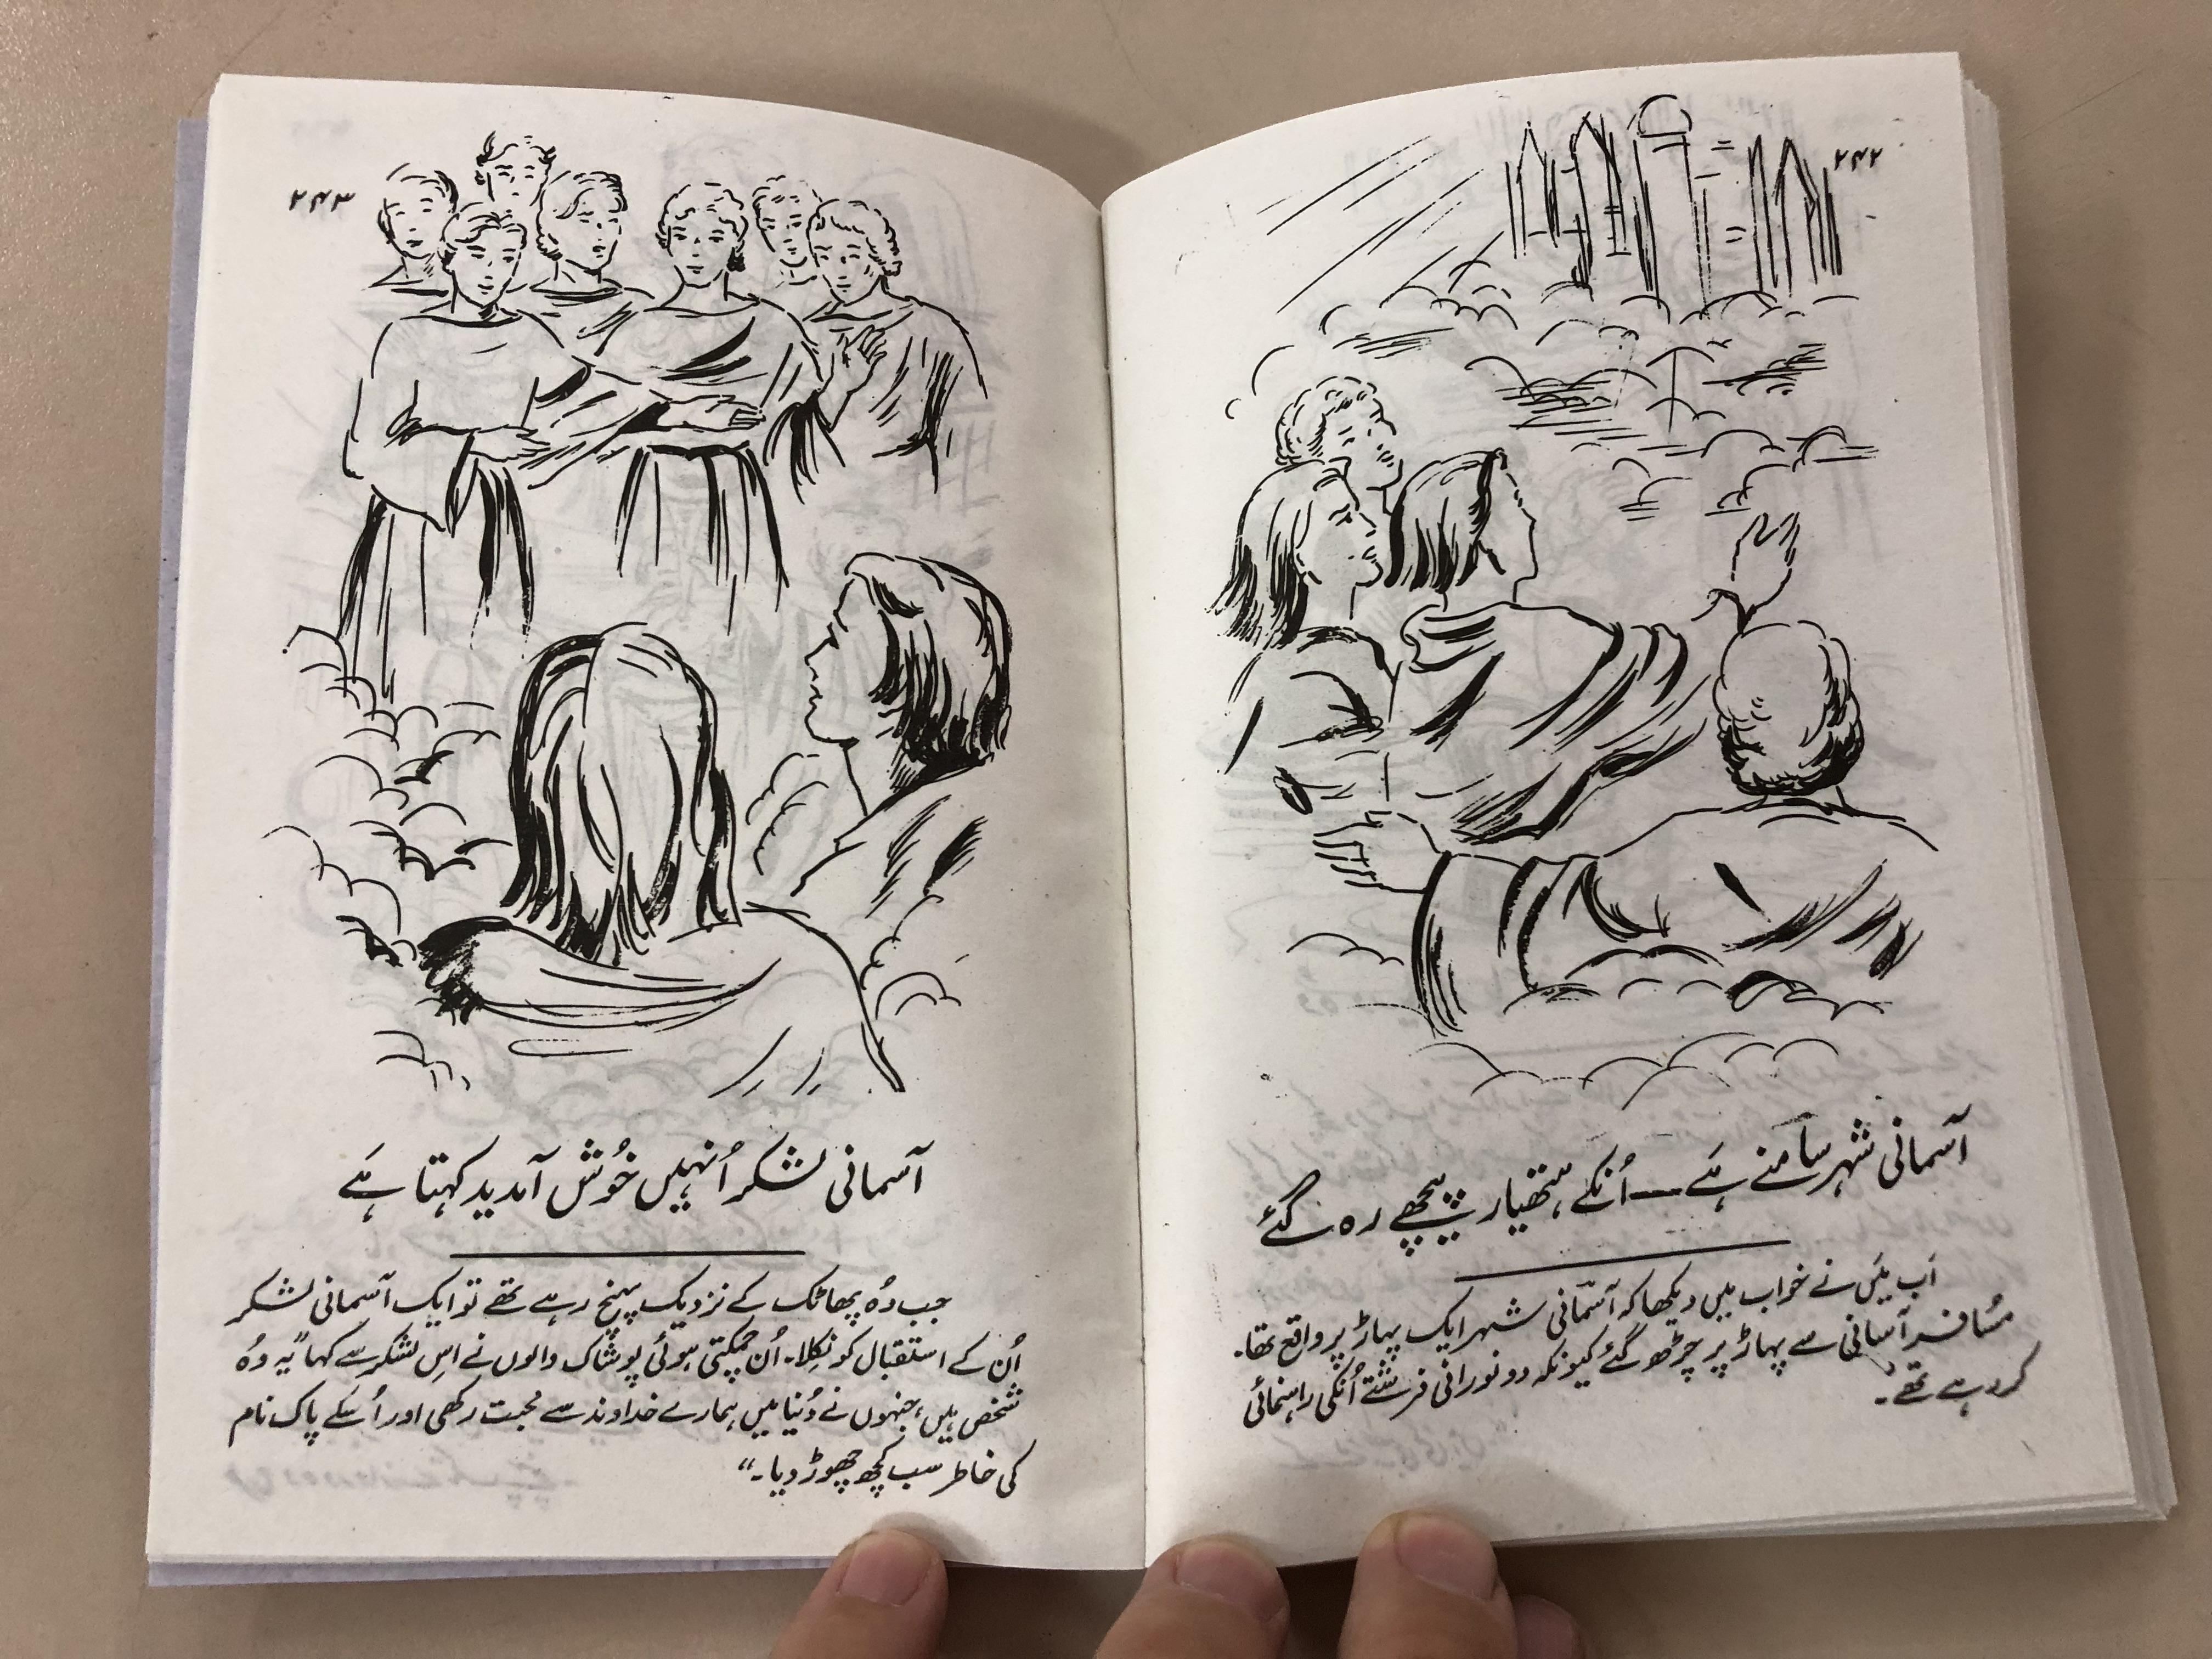 pictorial-pilgrim-s-progress-by-john-bunyan-in-urdu-language-hardcover-2019-masihi-isha-at-khana-11-.jpg